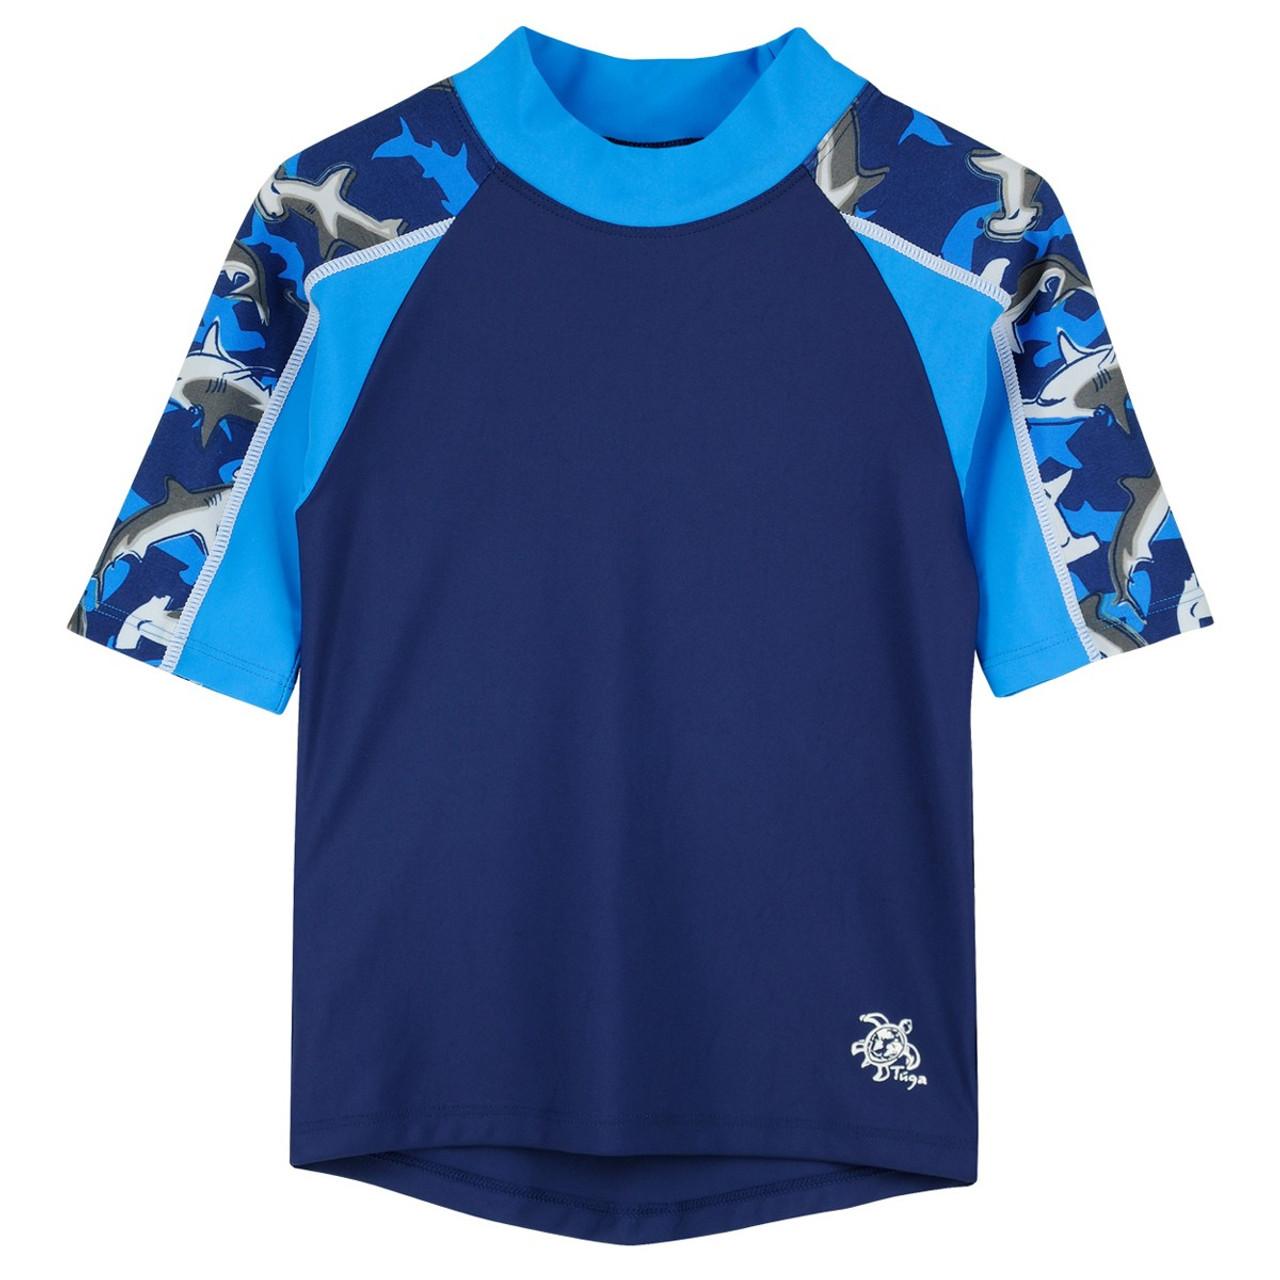 d430ad504c404 Boys Tuga Short Sleeve Swim Shirt 'Breaker' Surf | Boys UV Clothing